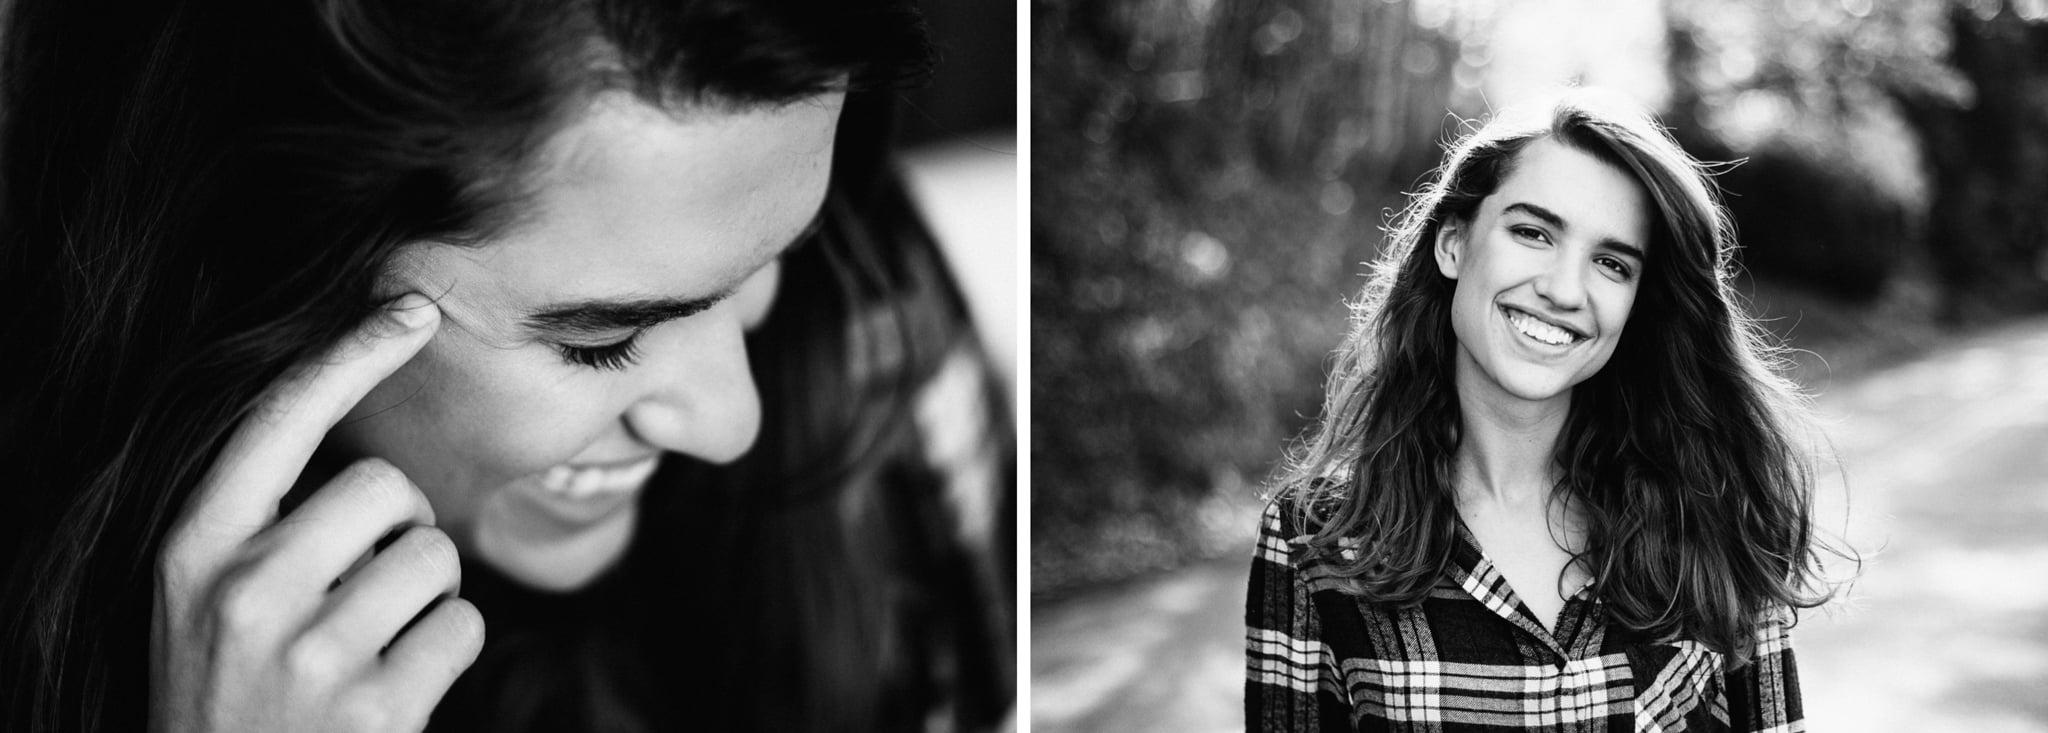 Vancouver Portrait Photographer - Emmy Lou Virginia Photography-12.jpg